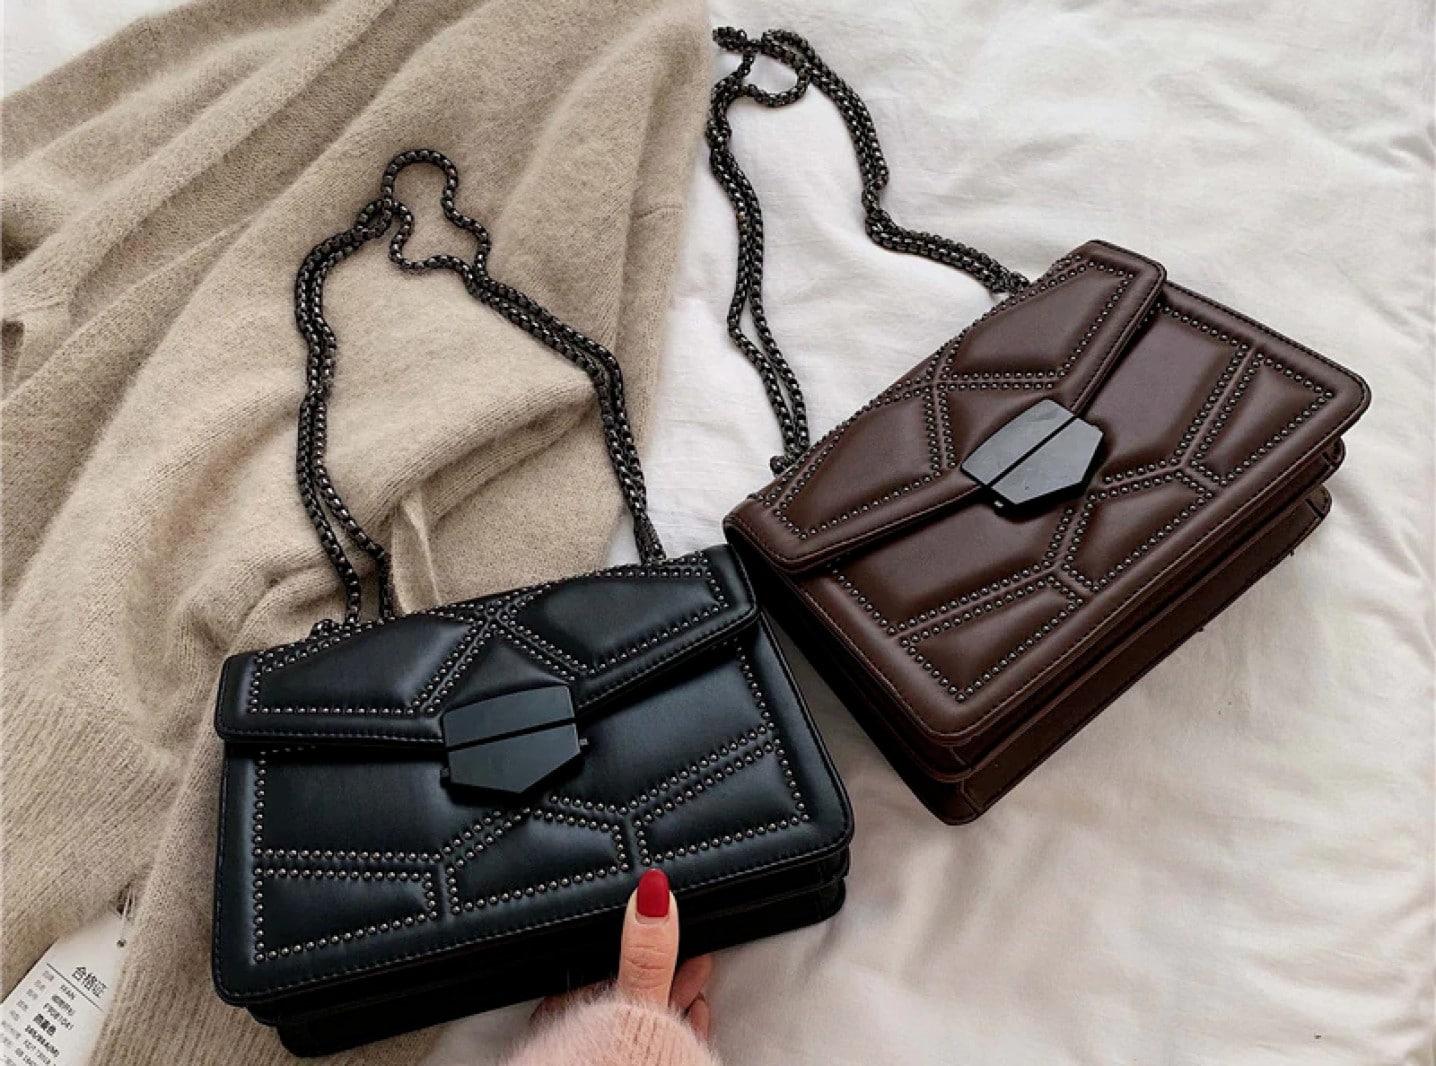 Introducing Masha Hasel, a new vegan leather handbags brand